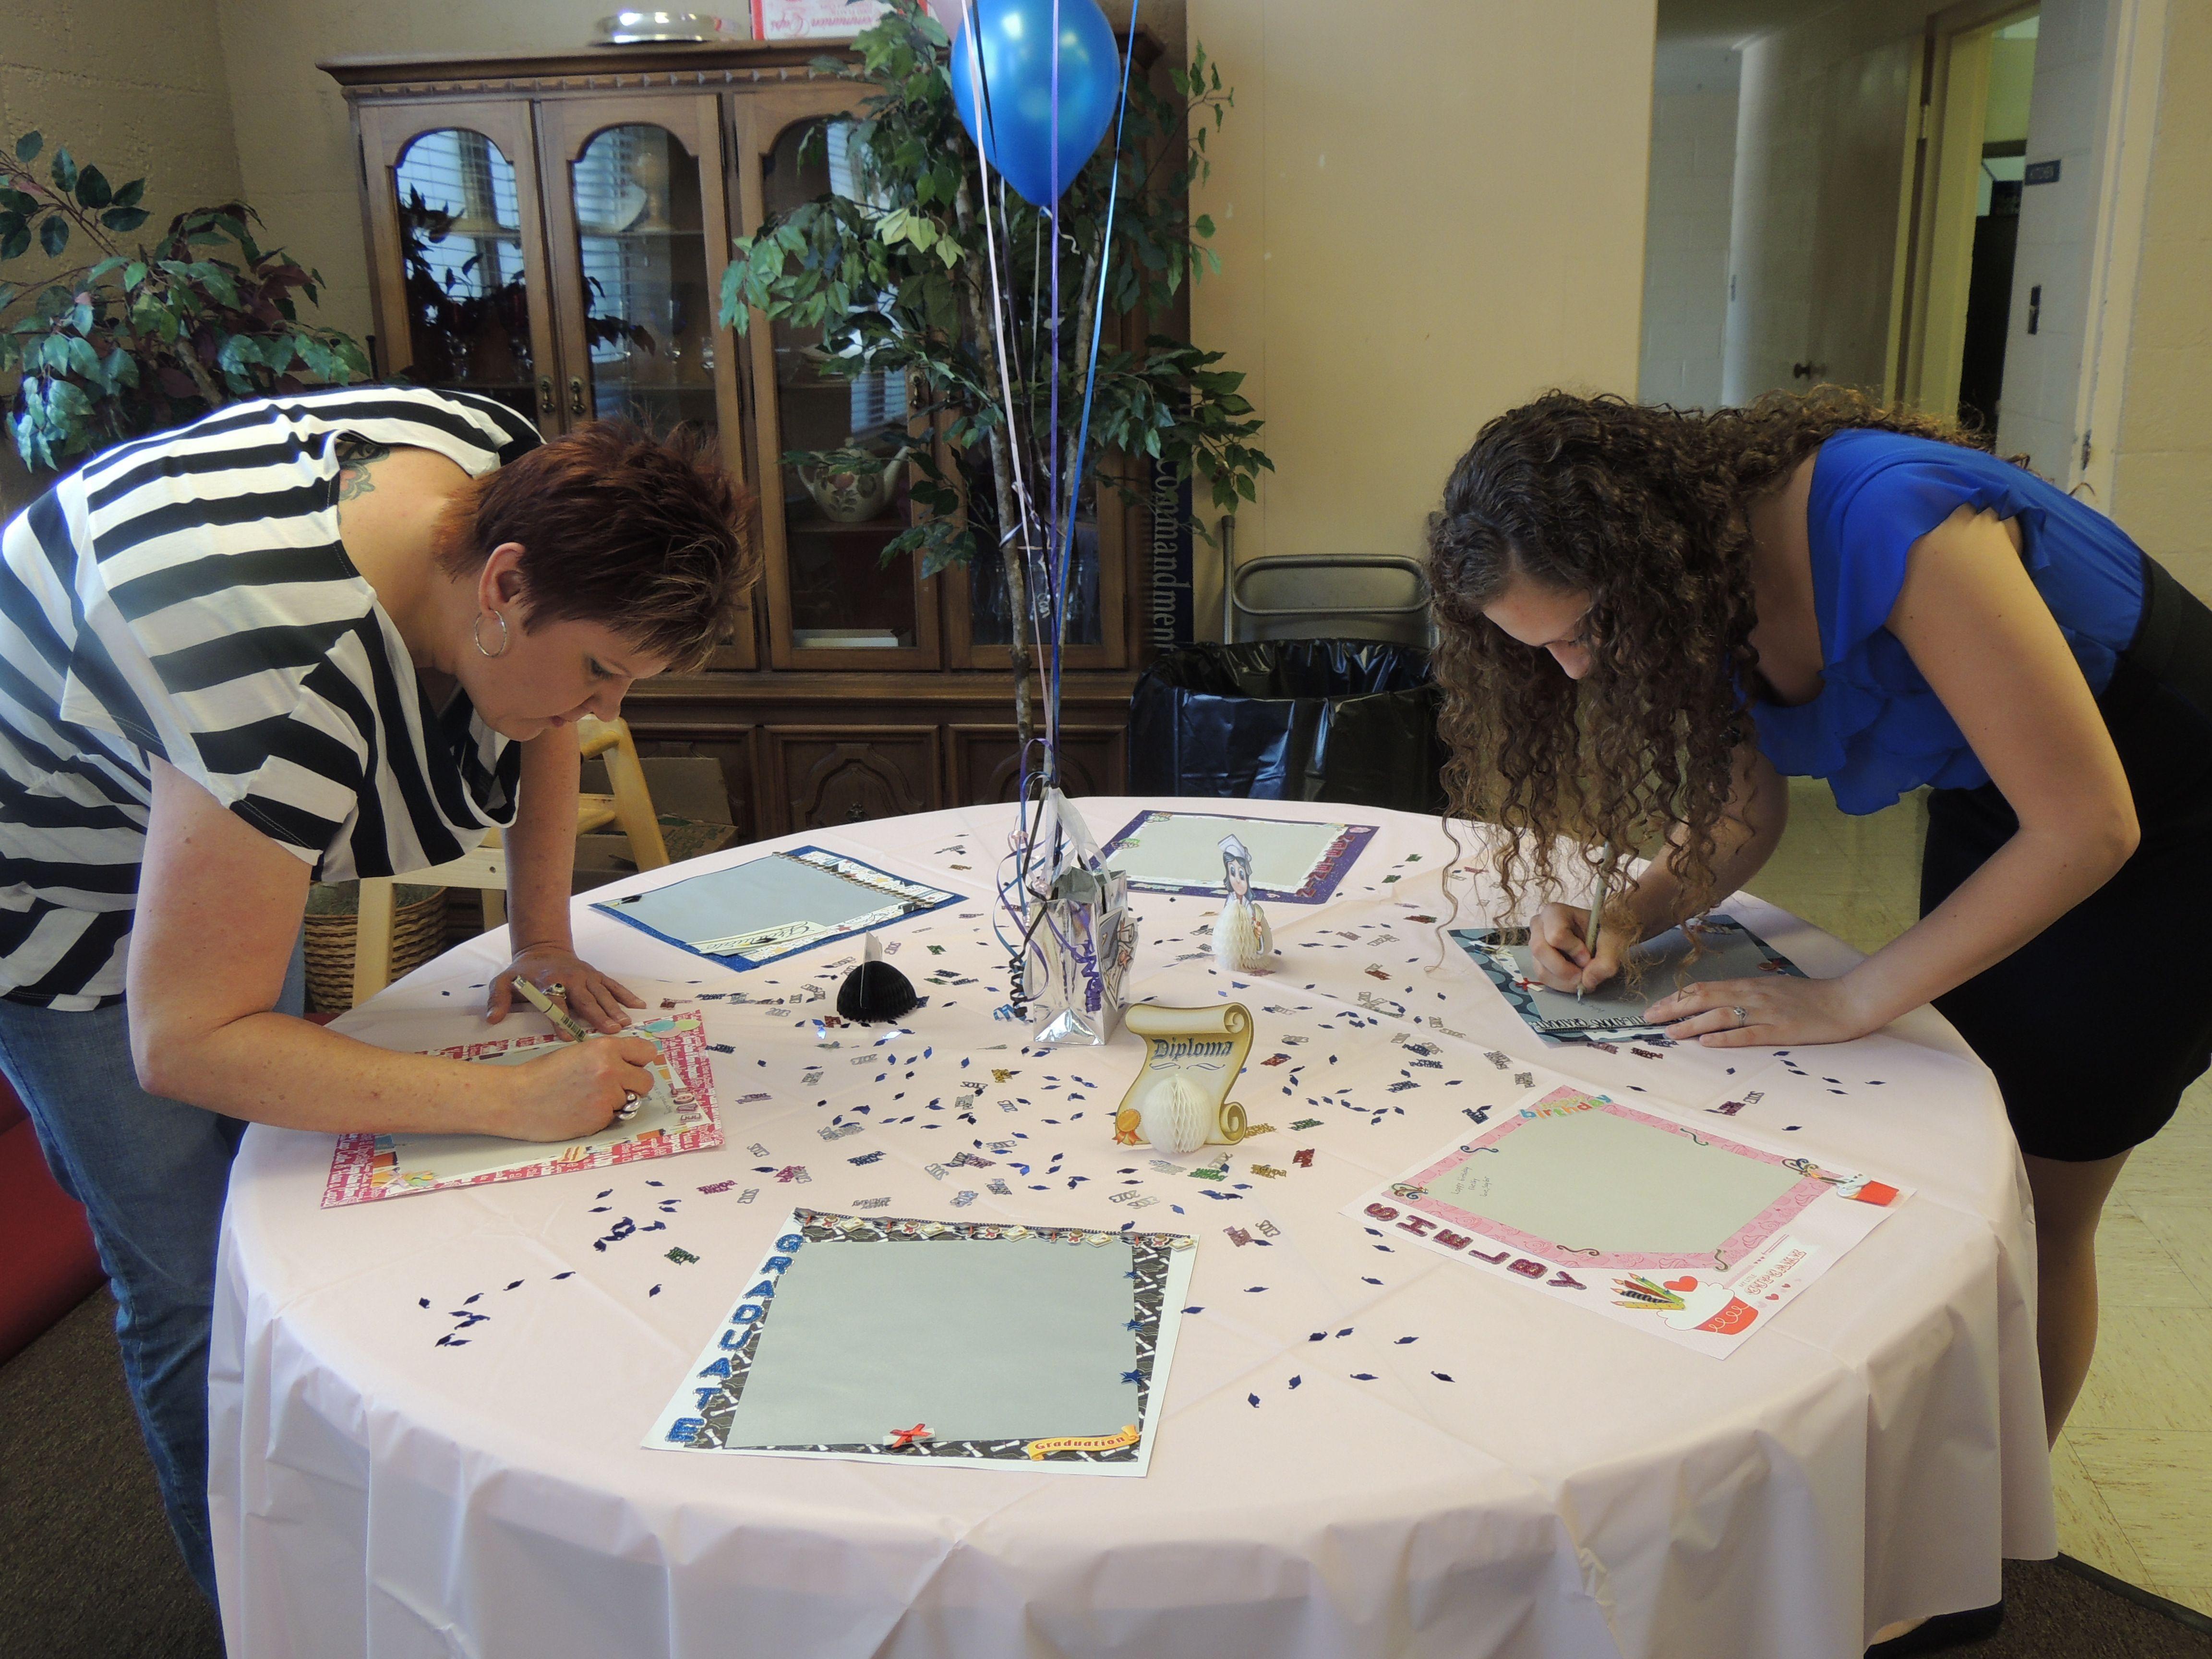 Graduation scrapbook ideas pinterest - Graduation Birthday Sign In Table Balloons Confetti Scrapbook Pages Decorations